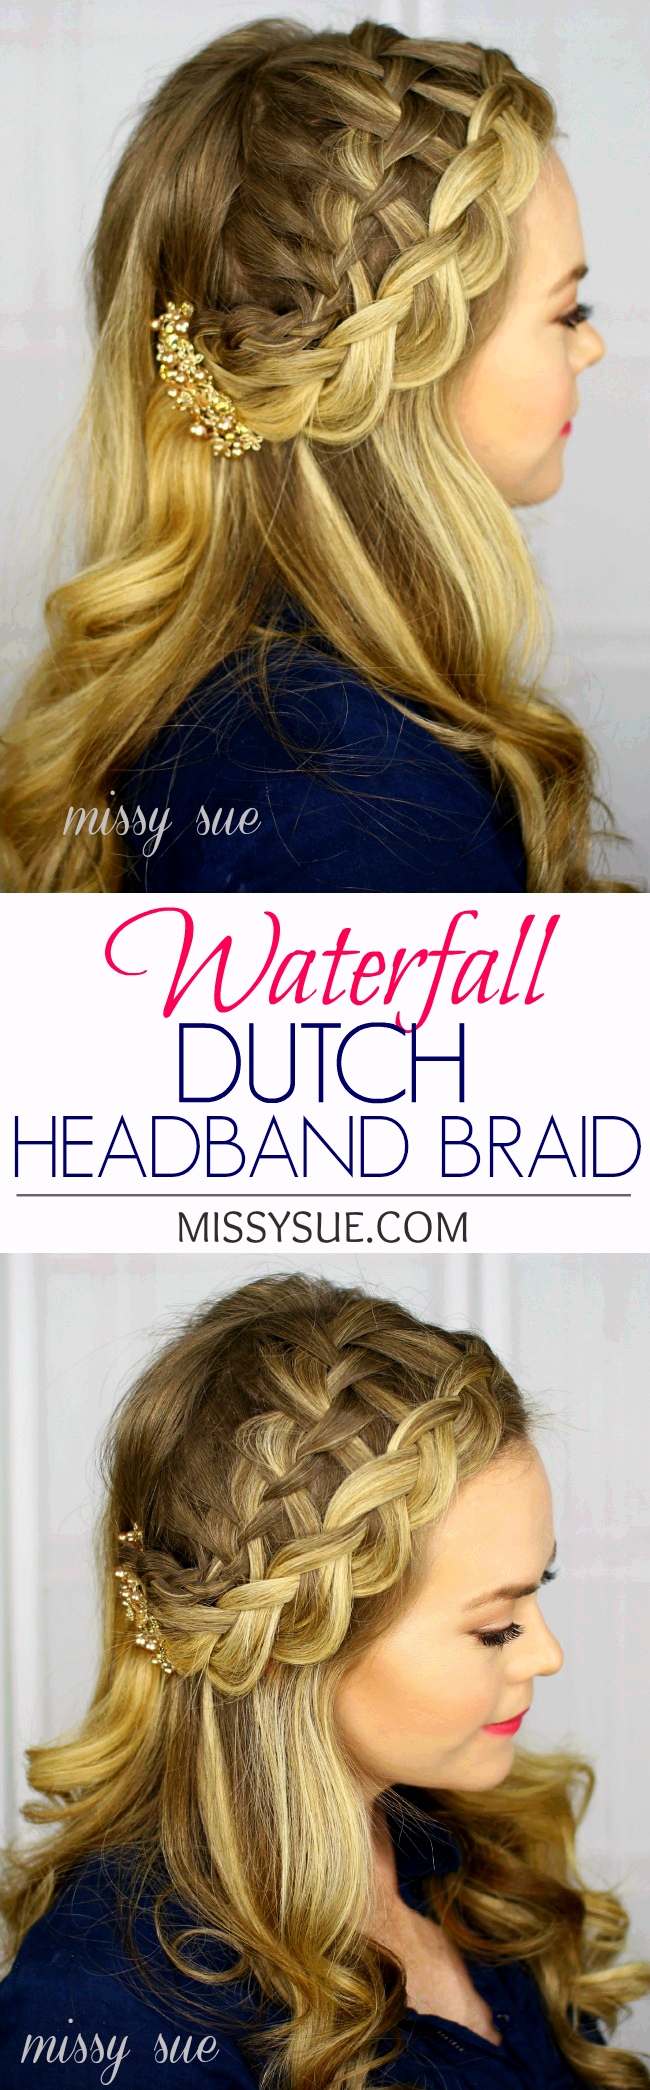 Waterfall Dutch Headband Braid